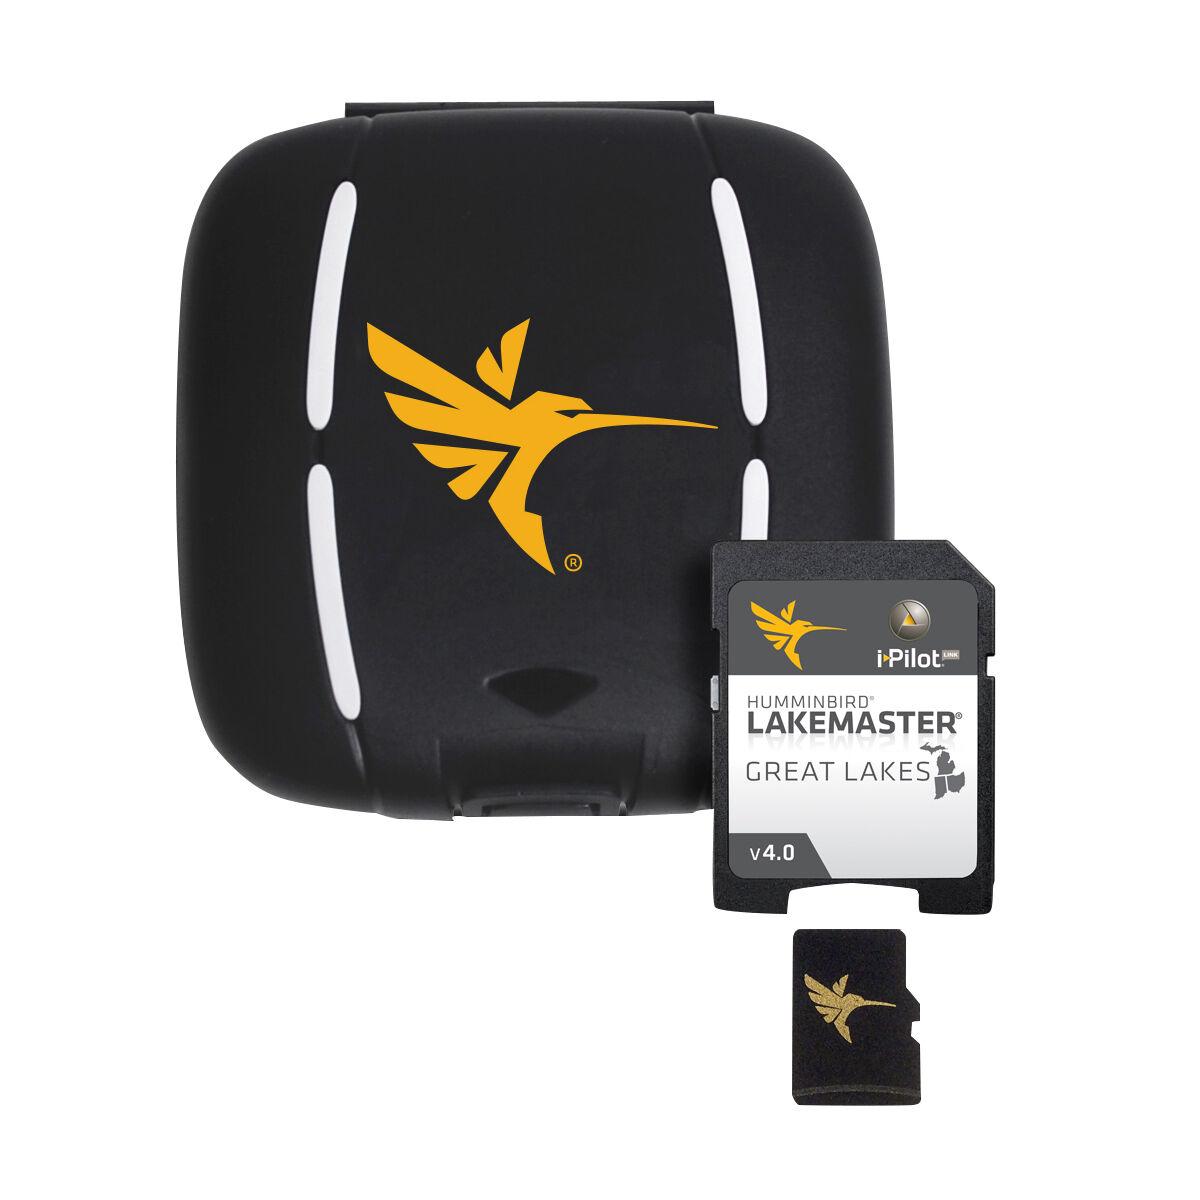 Humminbird LakeMaster Great Lakes Micro Map Card With SD Adapter